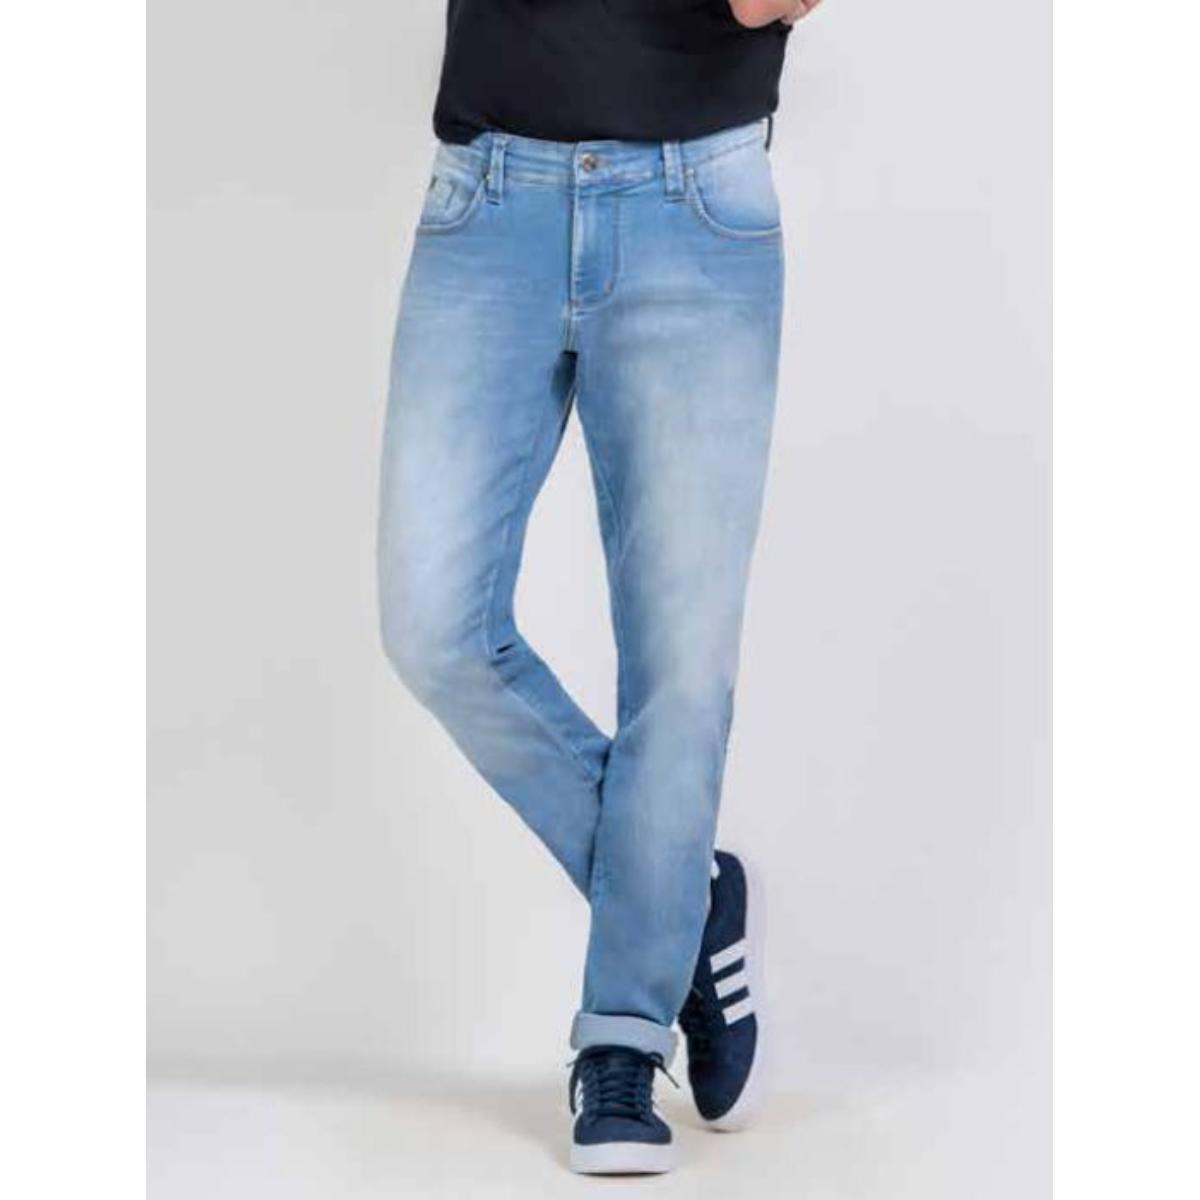 Calça Masculina Kacolako K37802 Jeans